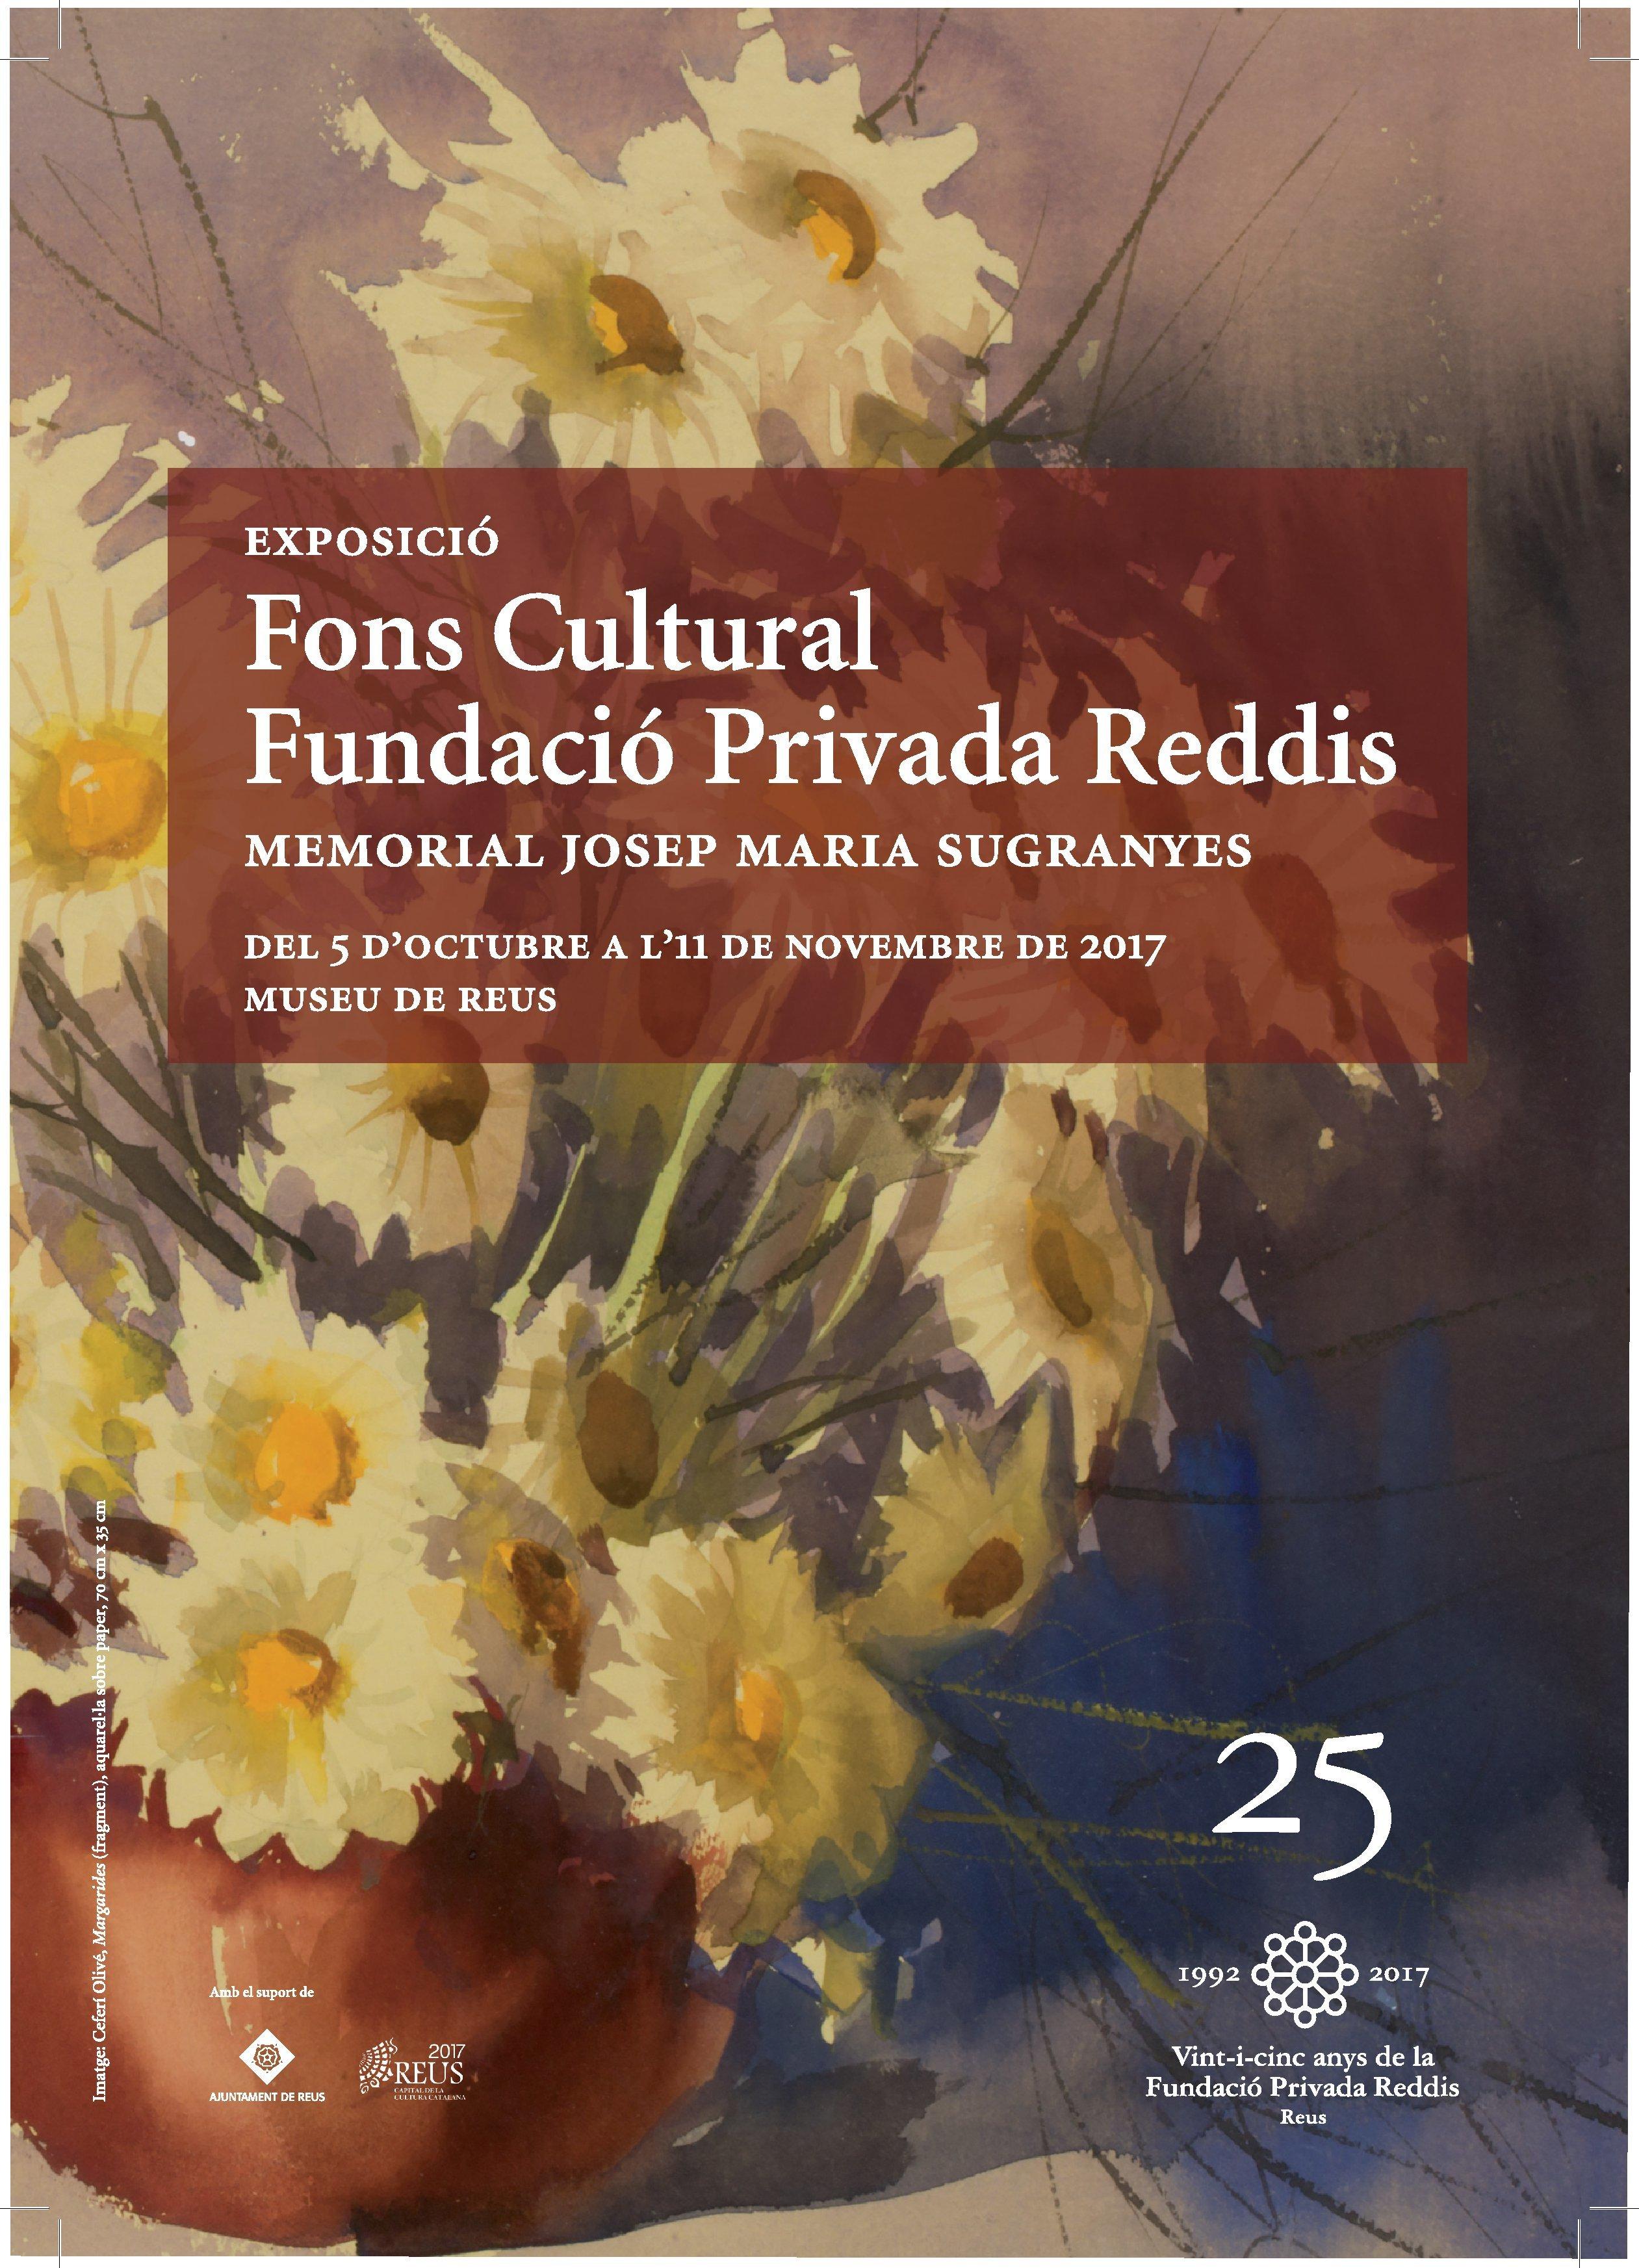 Fons cultural Fundació Privada Reddis. Memorial Josep Maria Sugranyes